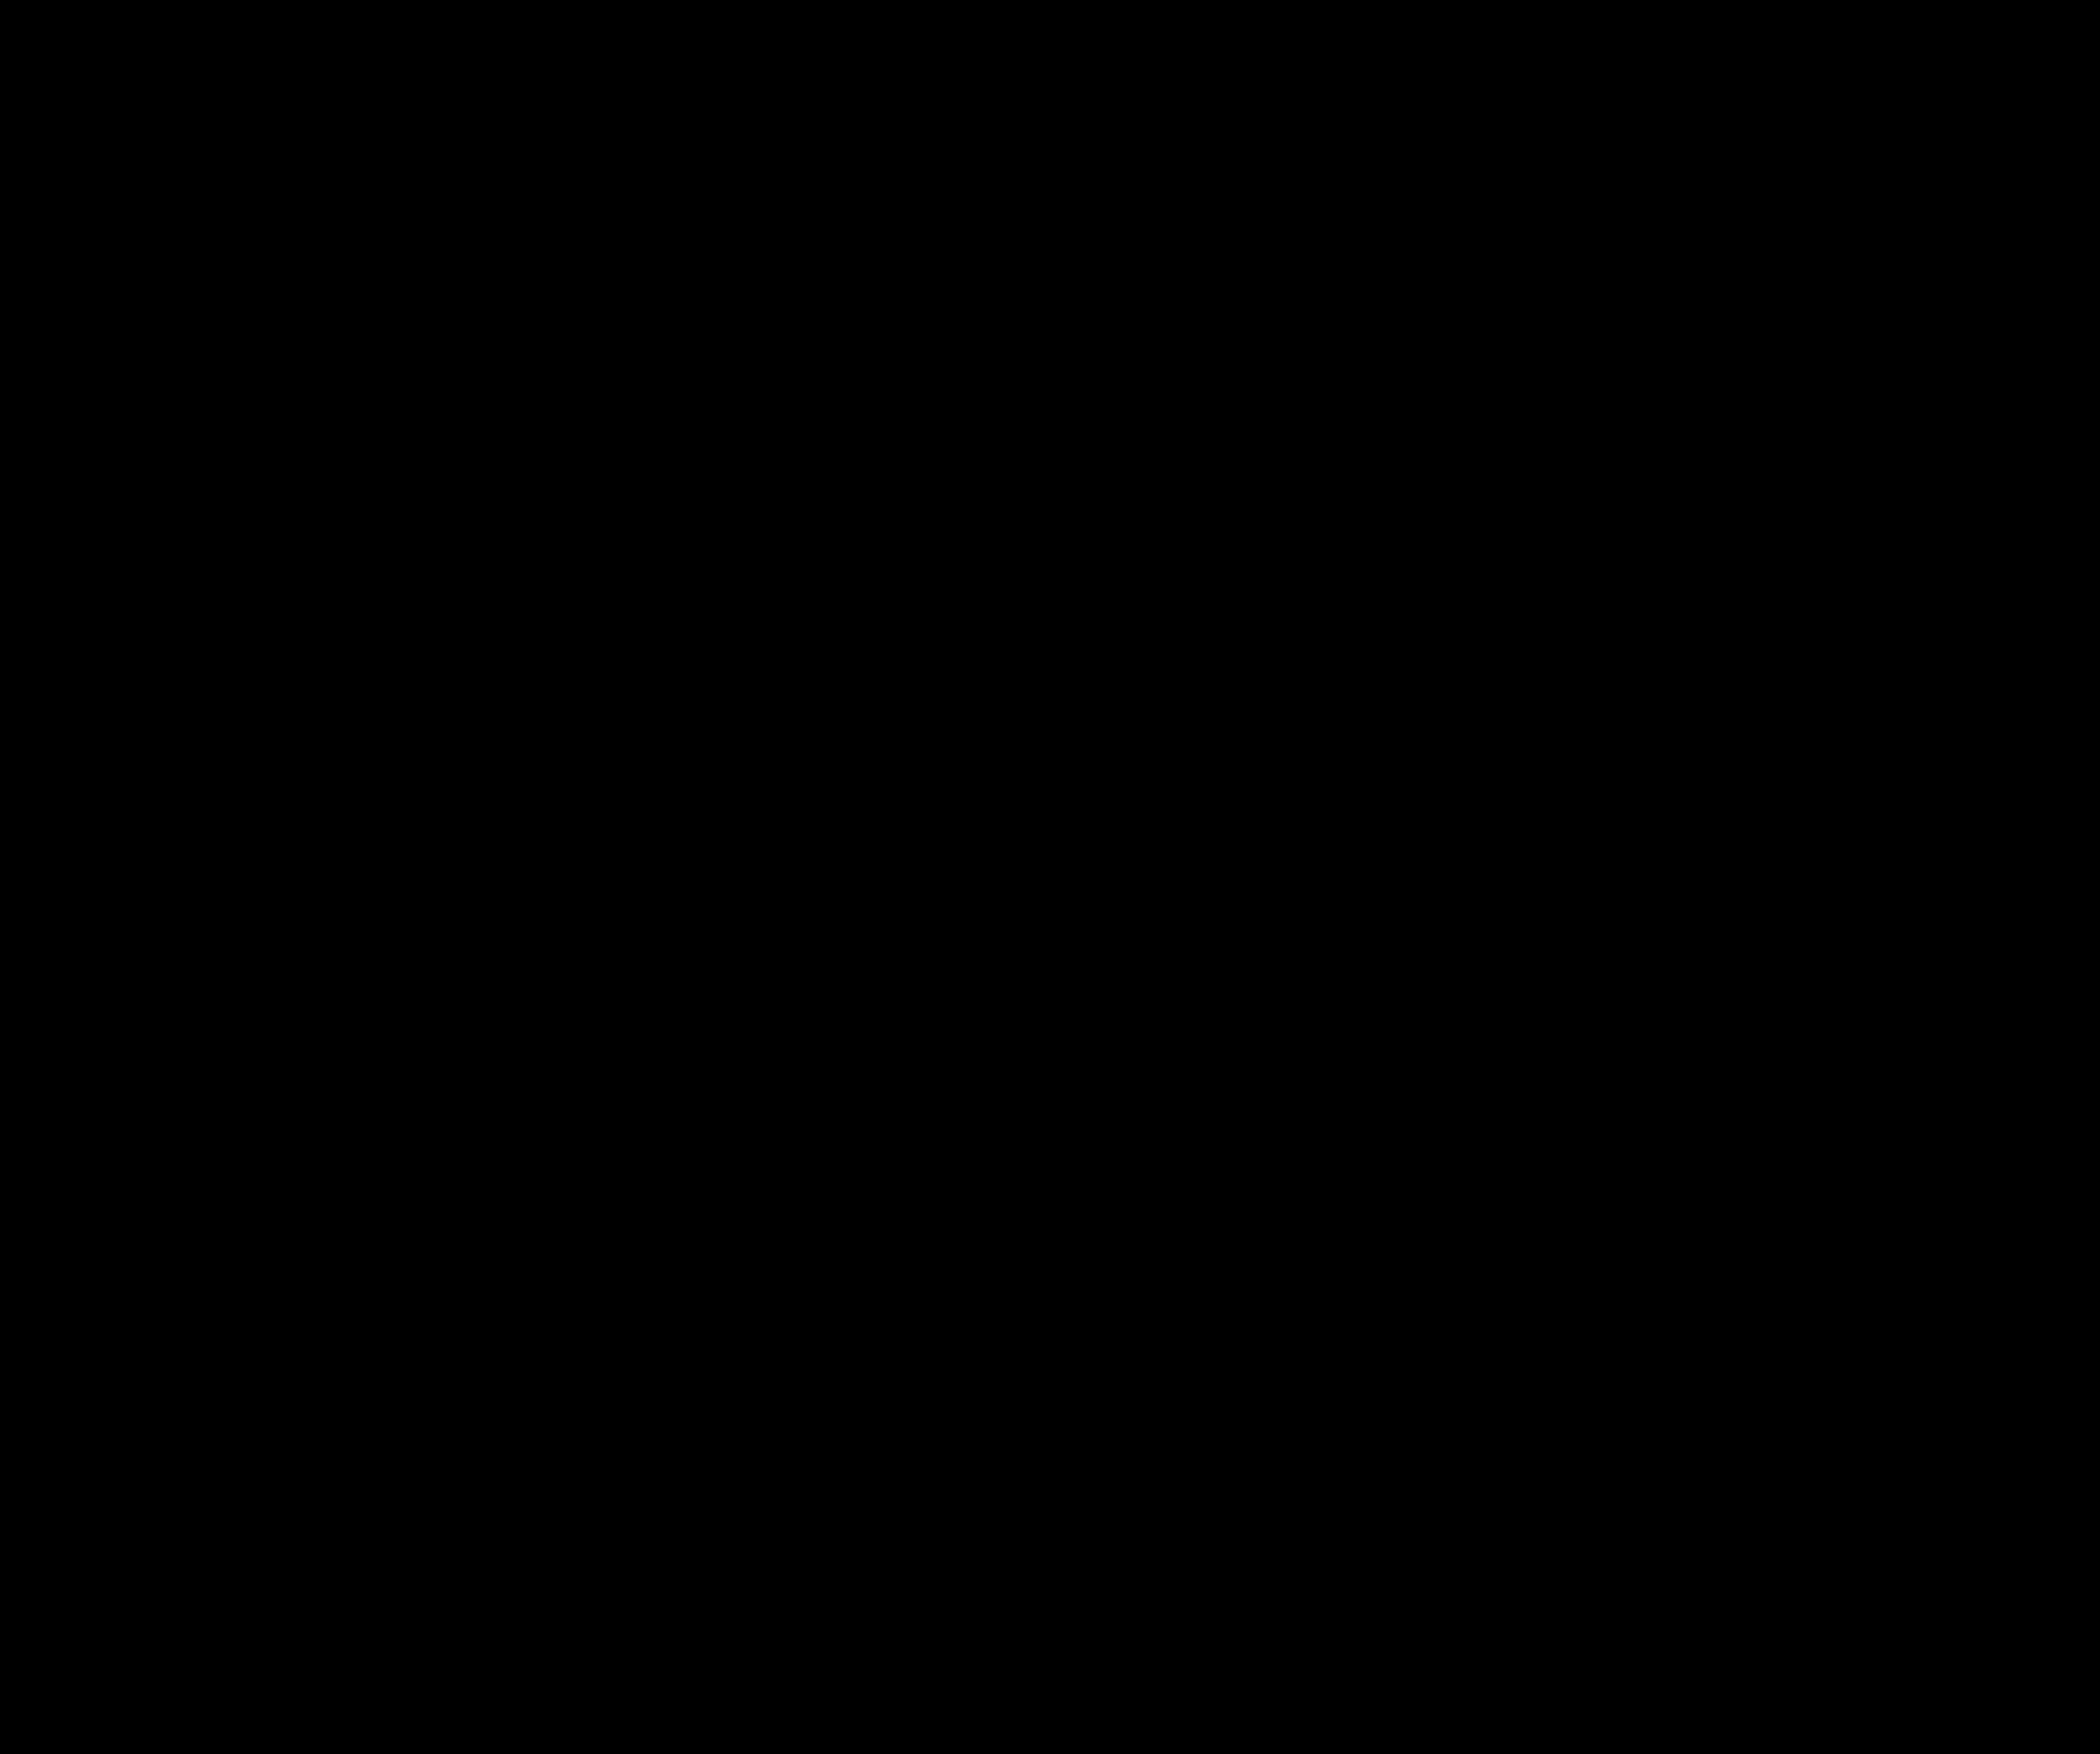 gecko clipart outline